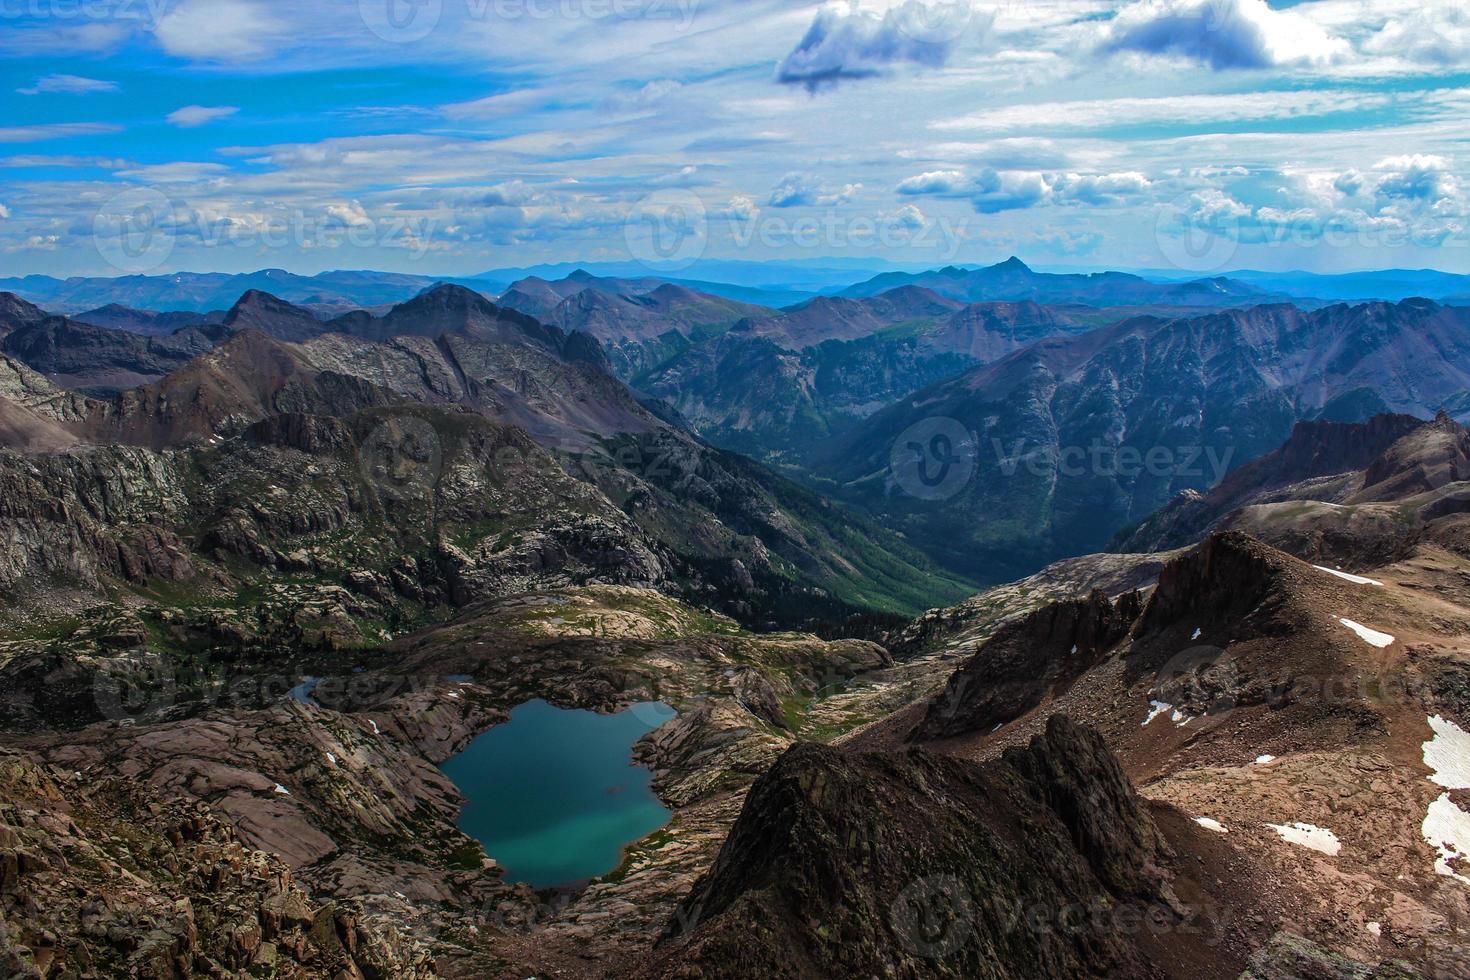 Colorado Rock Mountain Summit photo